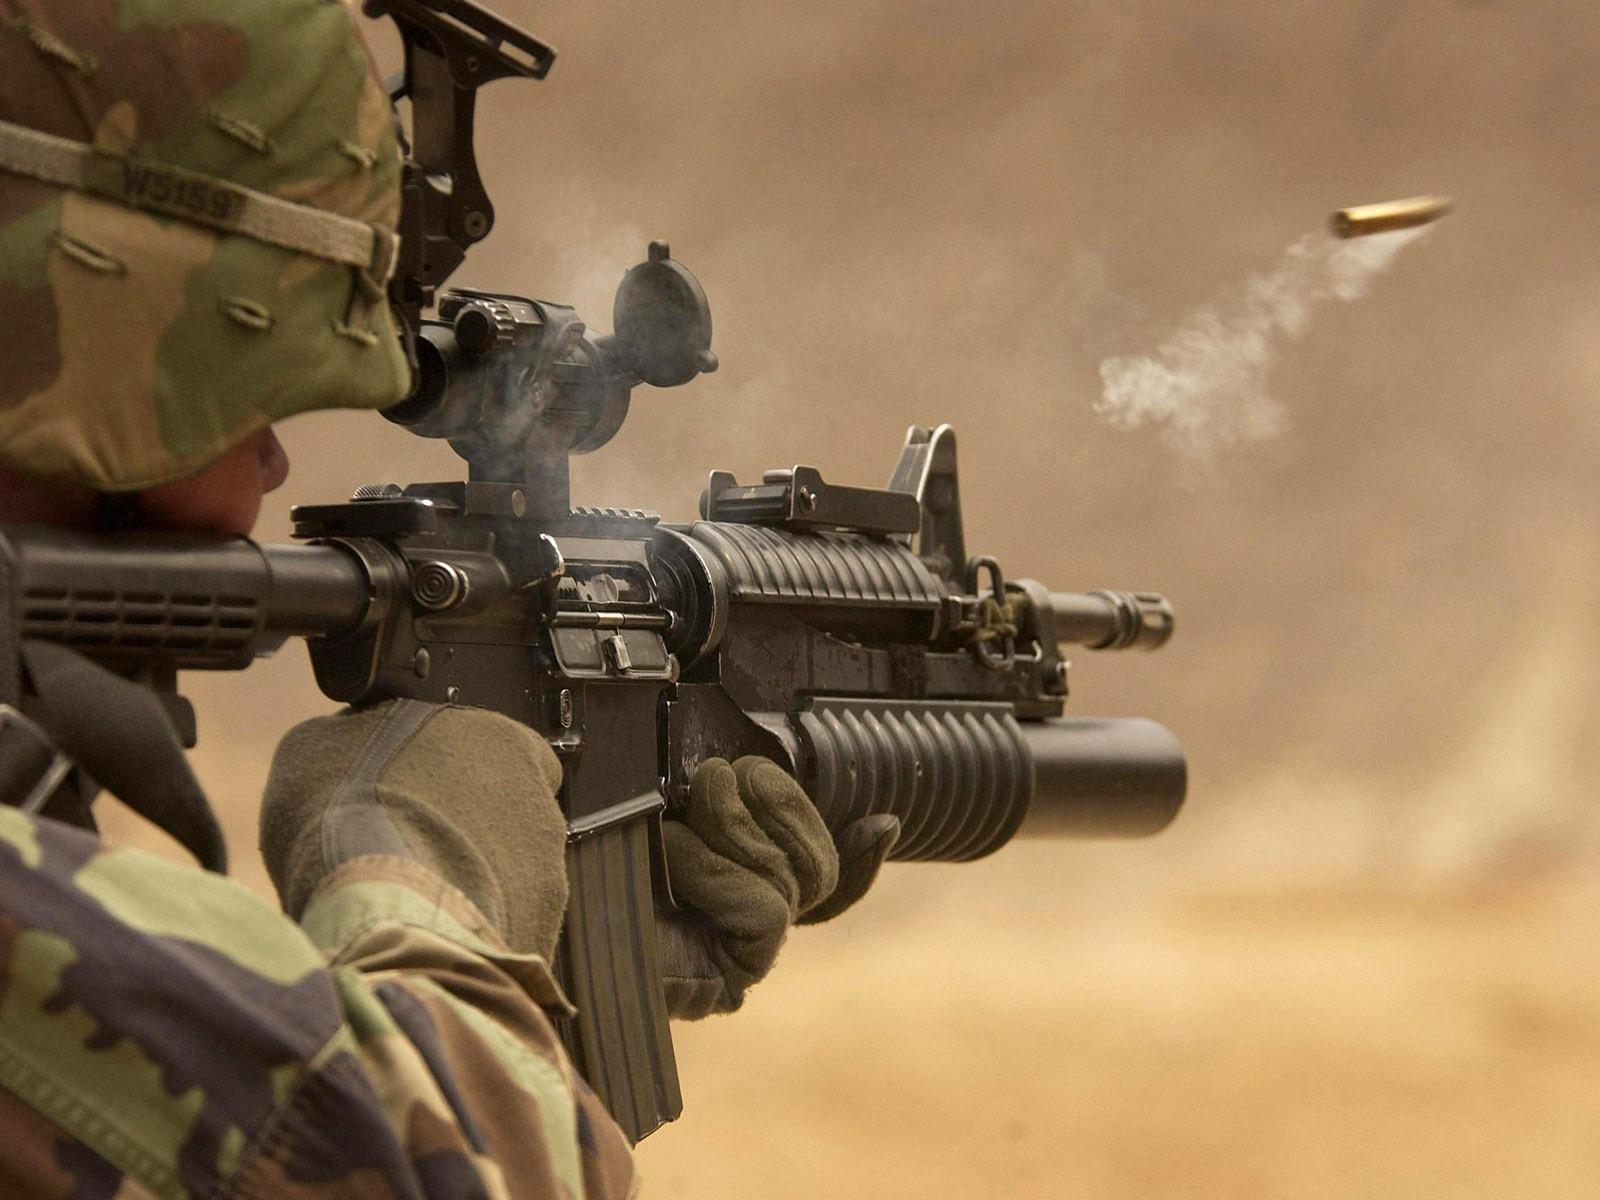 http://2.bp.blogspot.com/--hM7YKyRBvM/UKdGmDL8t4I/AAAAAAAACOA/I3mjnUhFyYw/s1600/Battlefield+soldier+Wallpaper+Military+Wallpaper+2+5.jpg